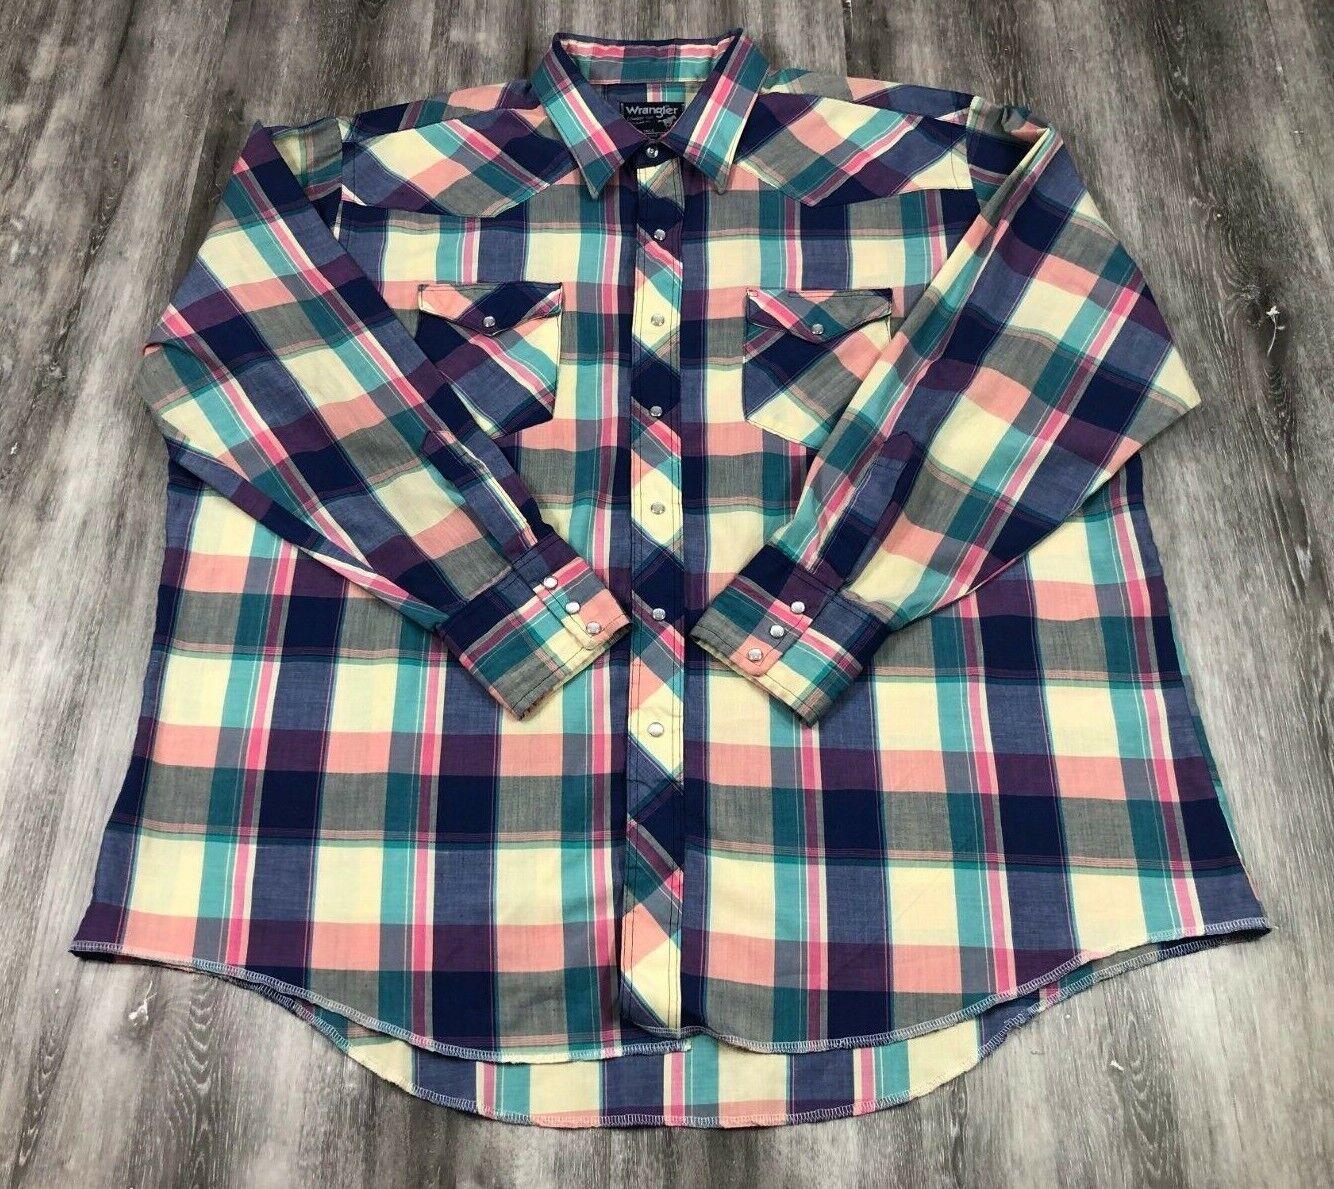 WRANGLER Cowboy Cut Regular Fit X-Long Tails Plaid Long Sleeve Snap Button Shirt